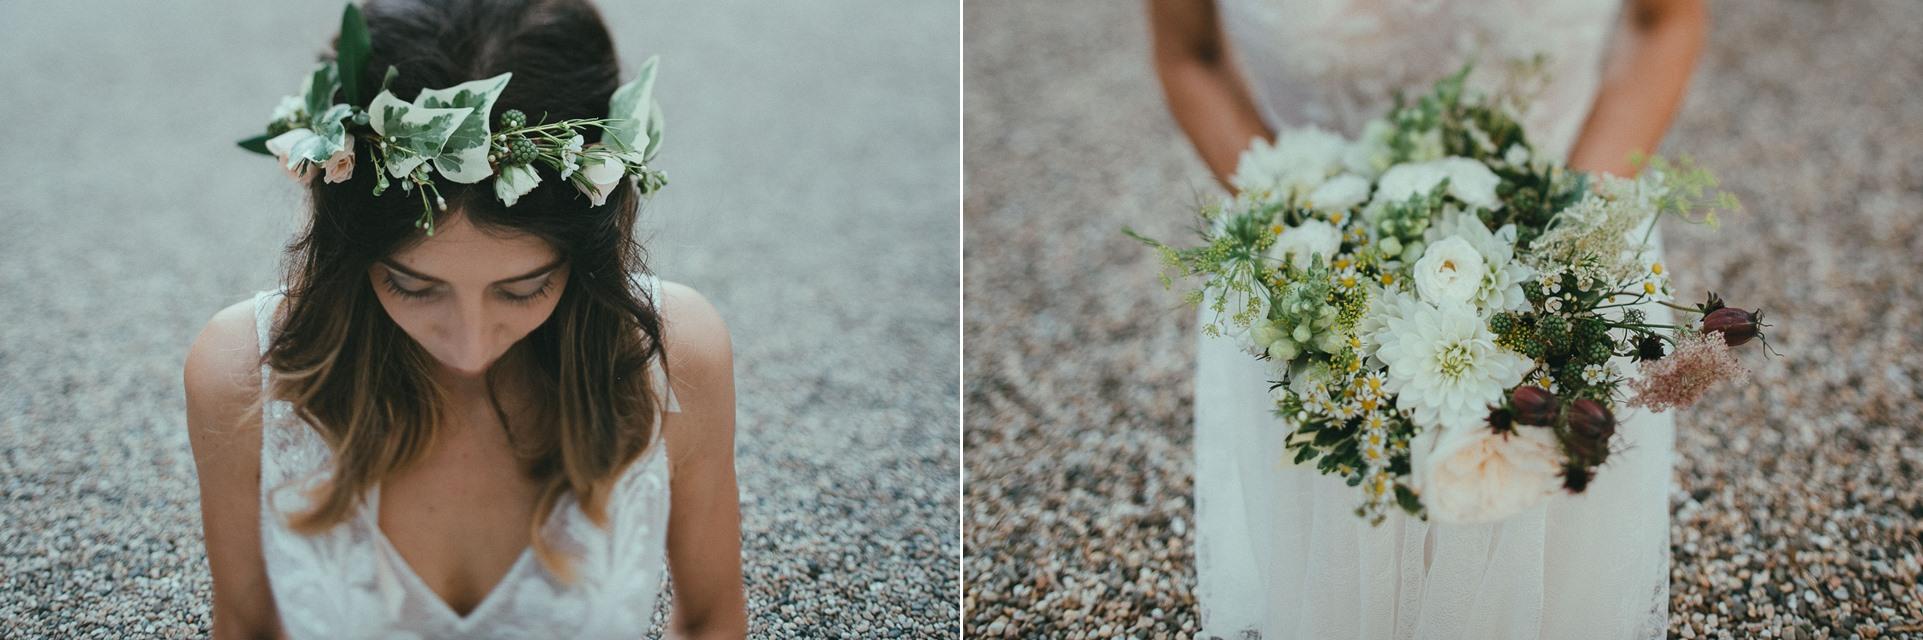 90-bride-flowers-crown-bouquet.jpg